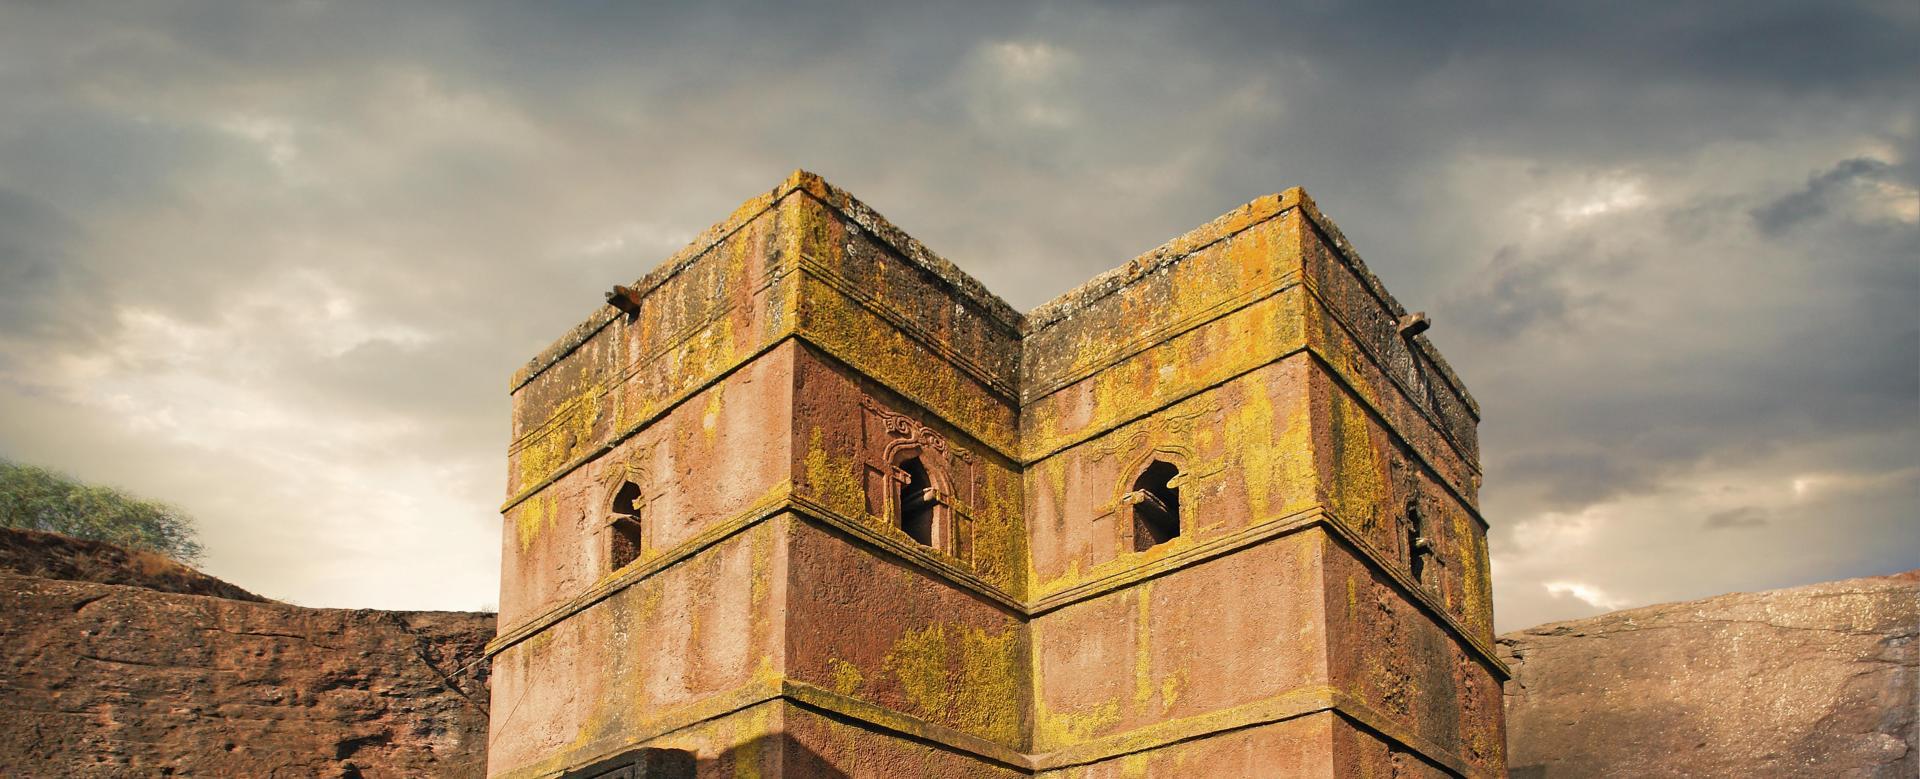 Voyage à pied : Fascinante ethiopie